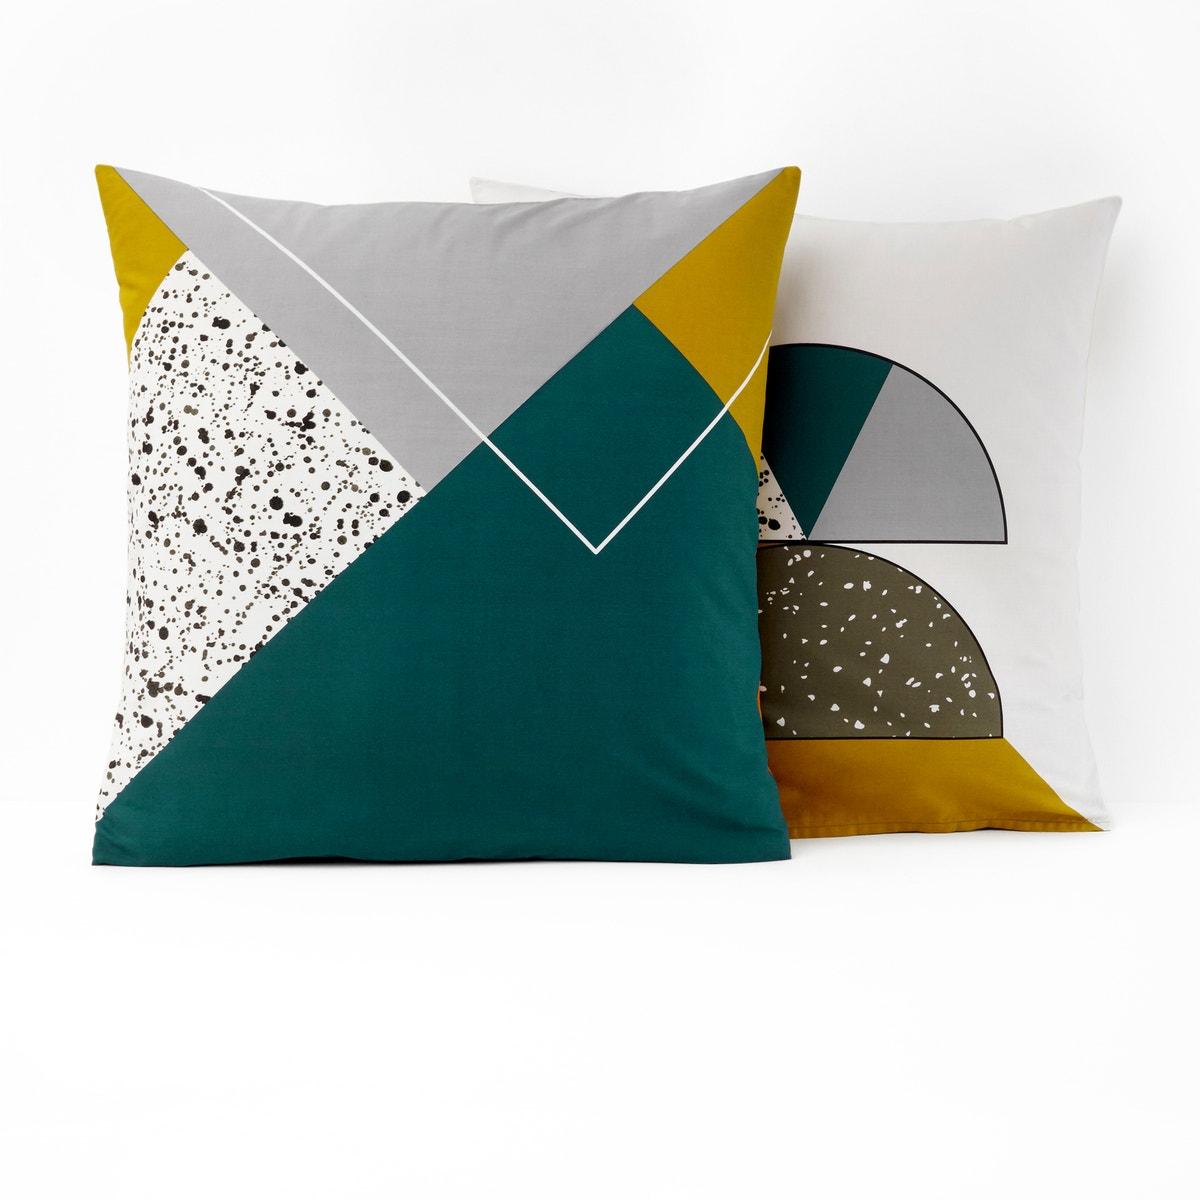 Hilda コットン 幾何学模様プリント枕カバー